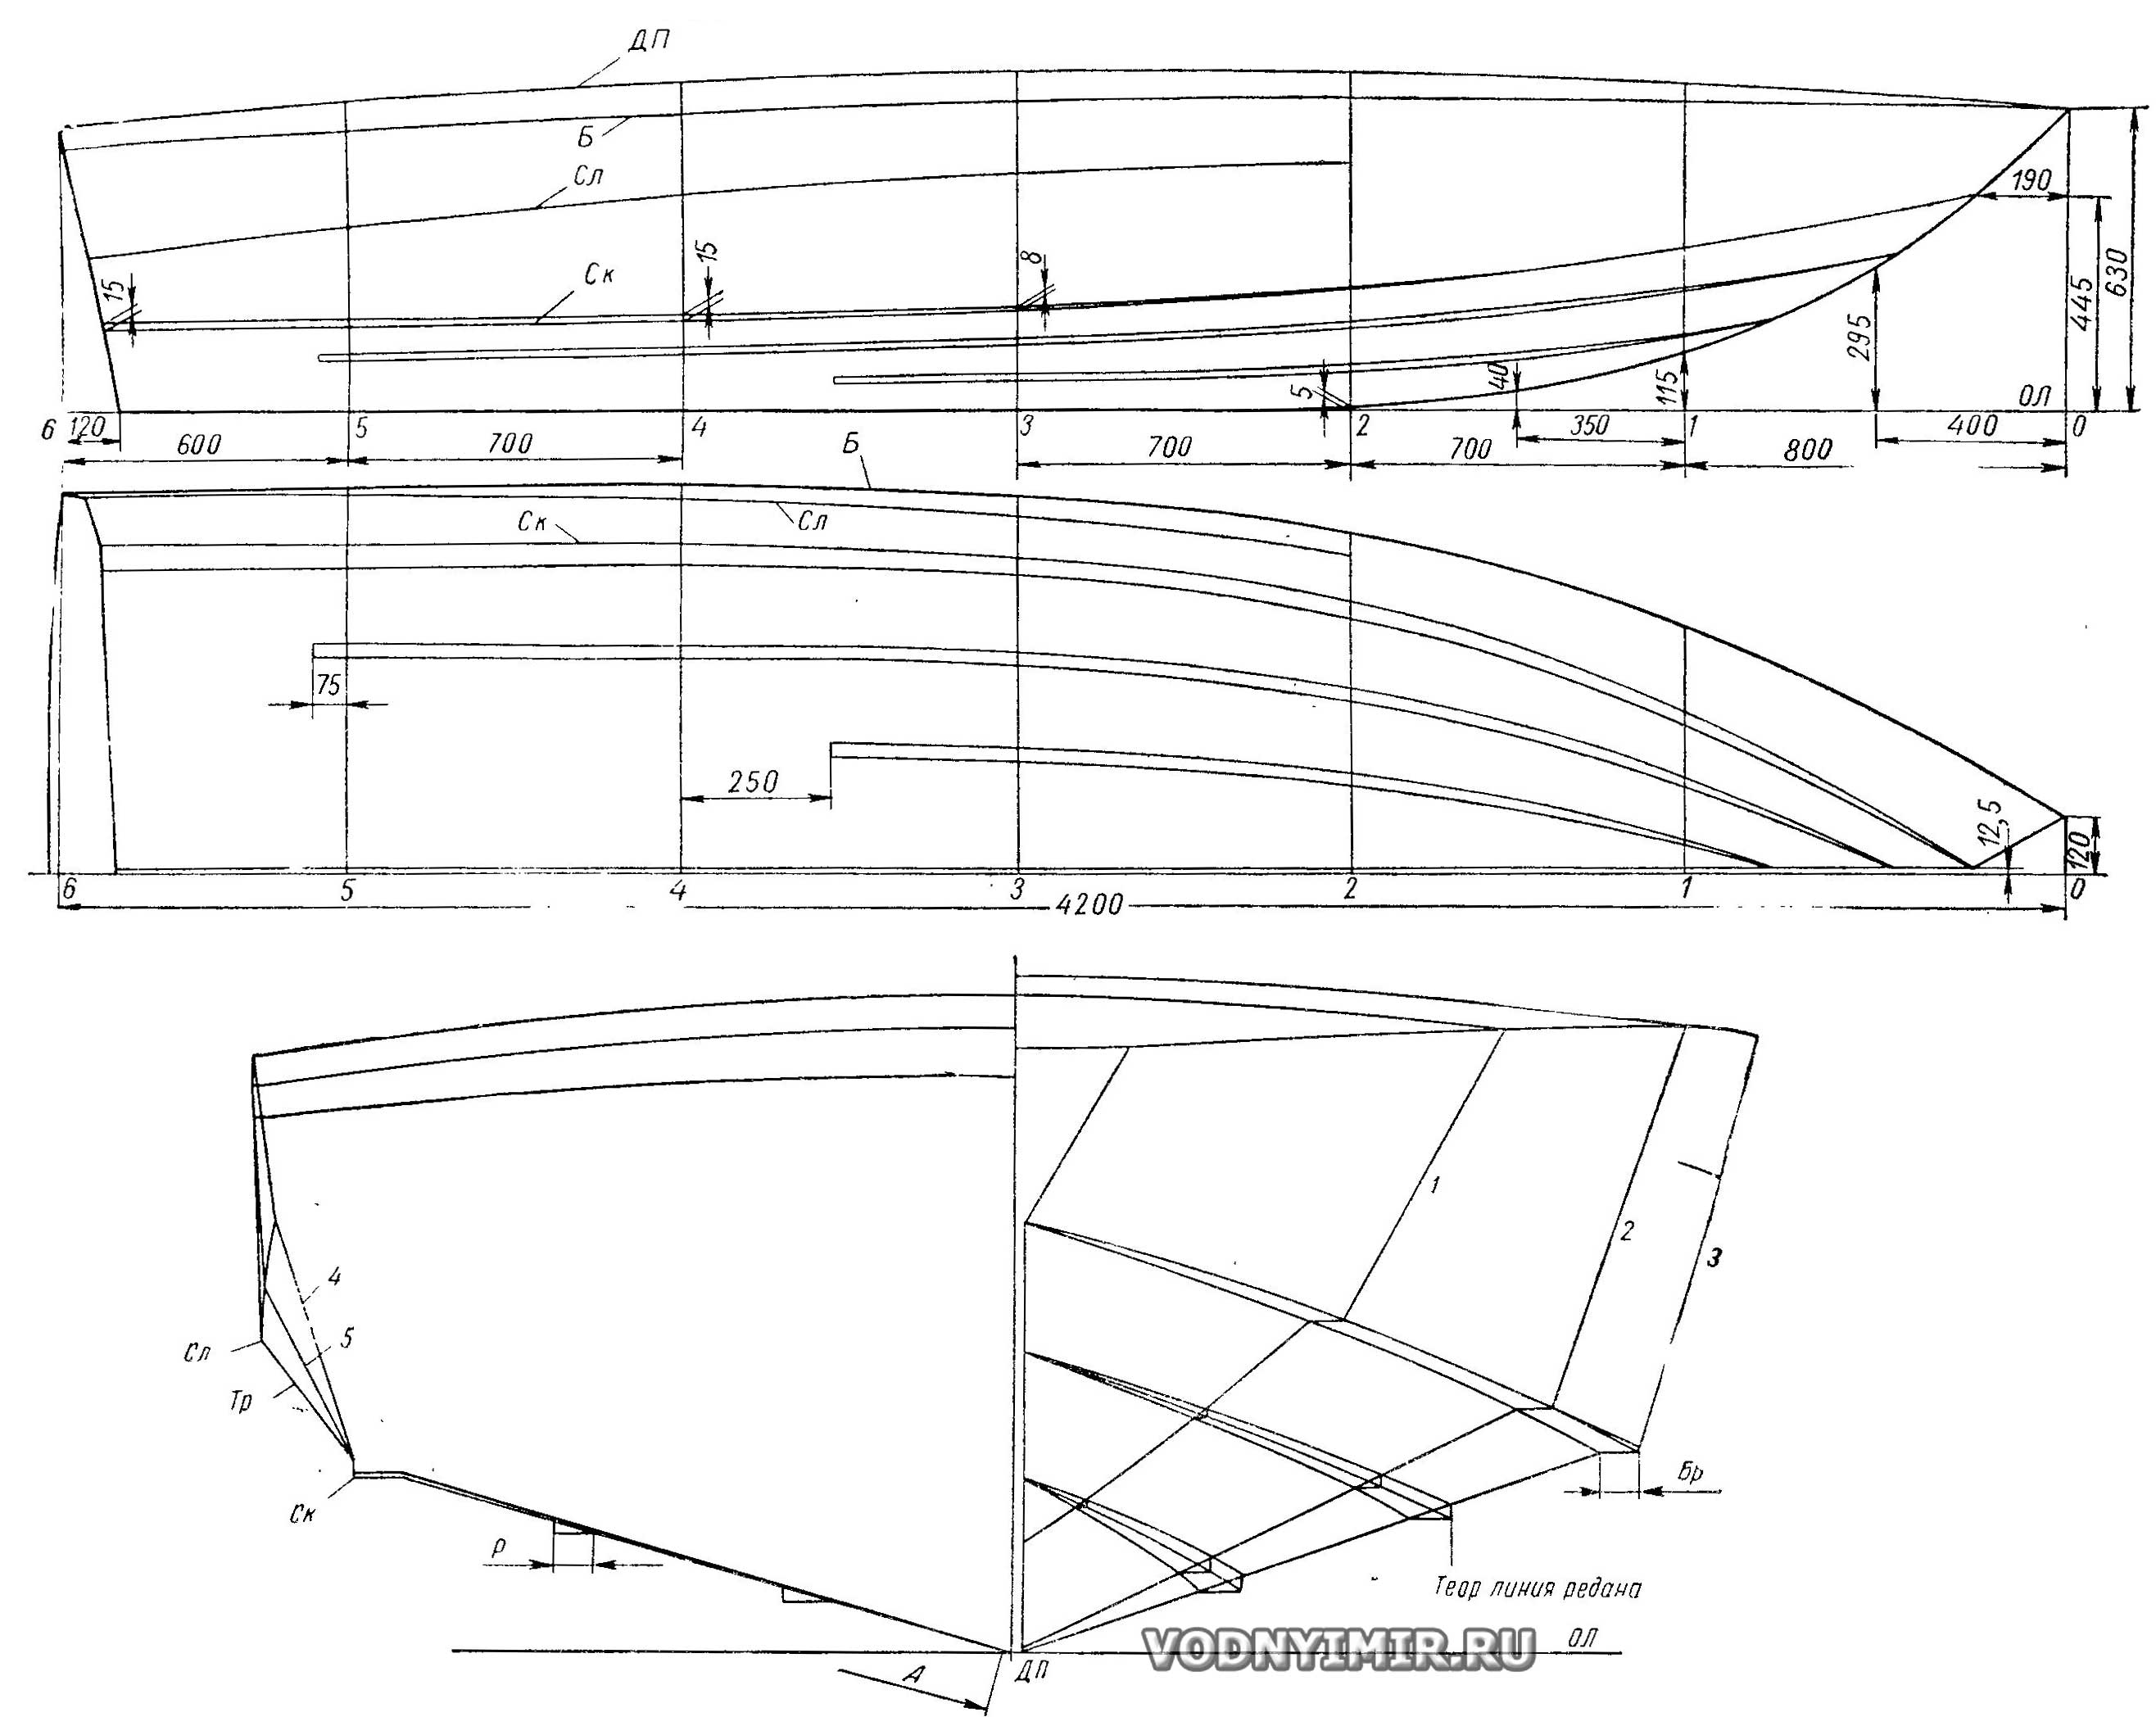 Лодки из фанеры своими руками под мотор 15 л.с